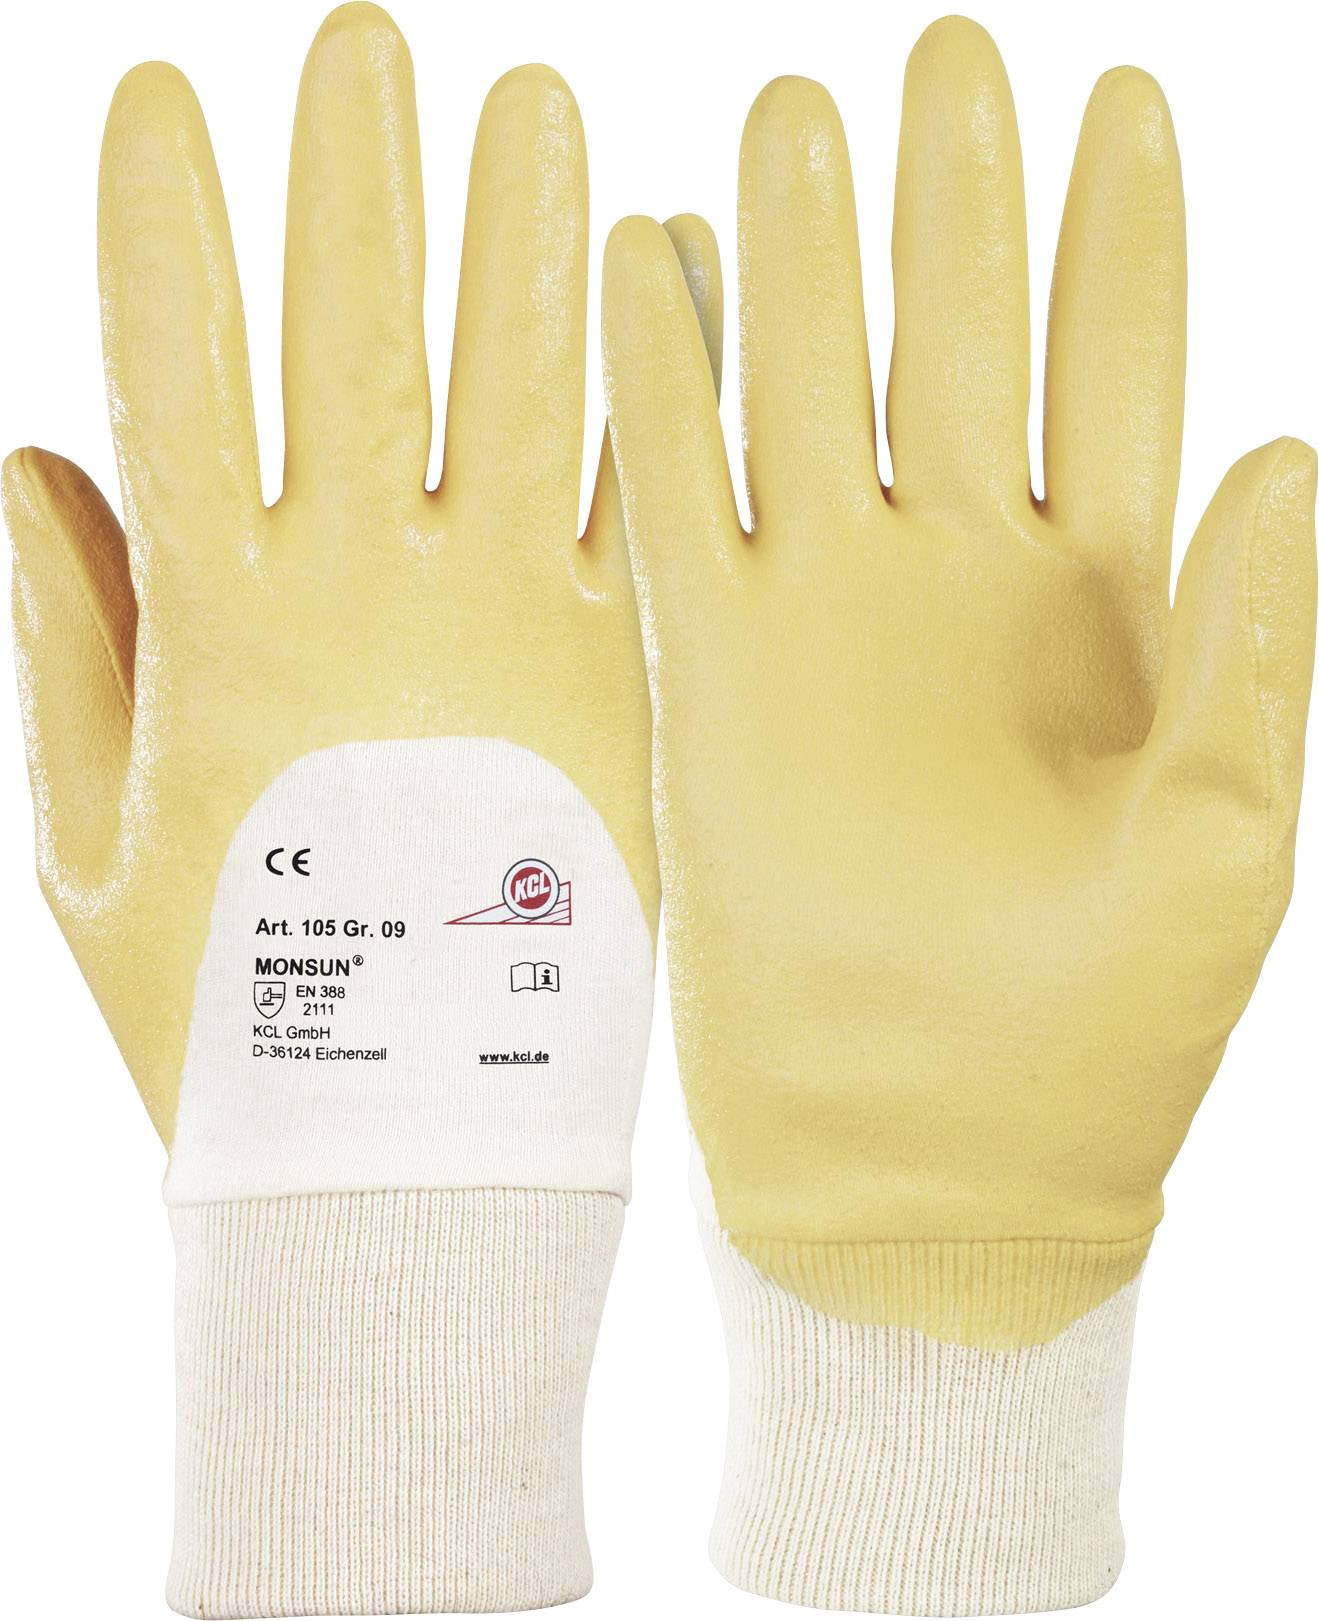 Pracovné rukavice KCL Monsun® 105, velikost rukavic: 7, S